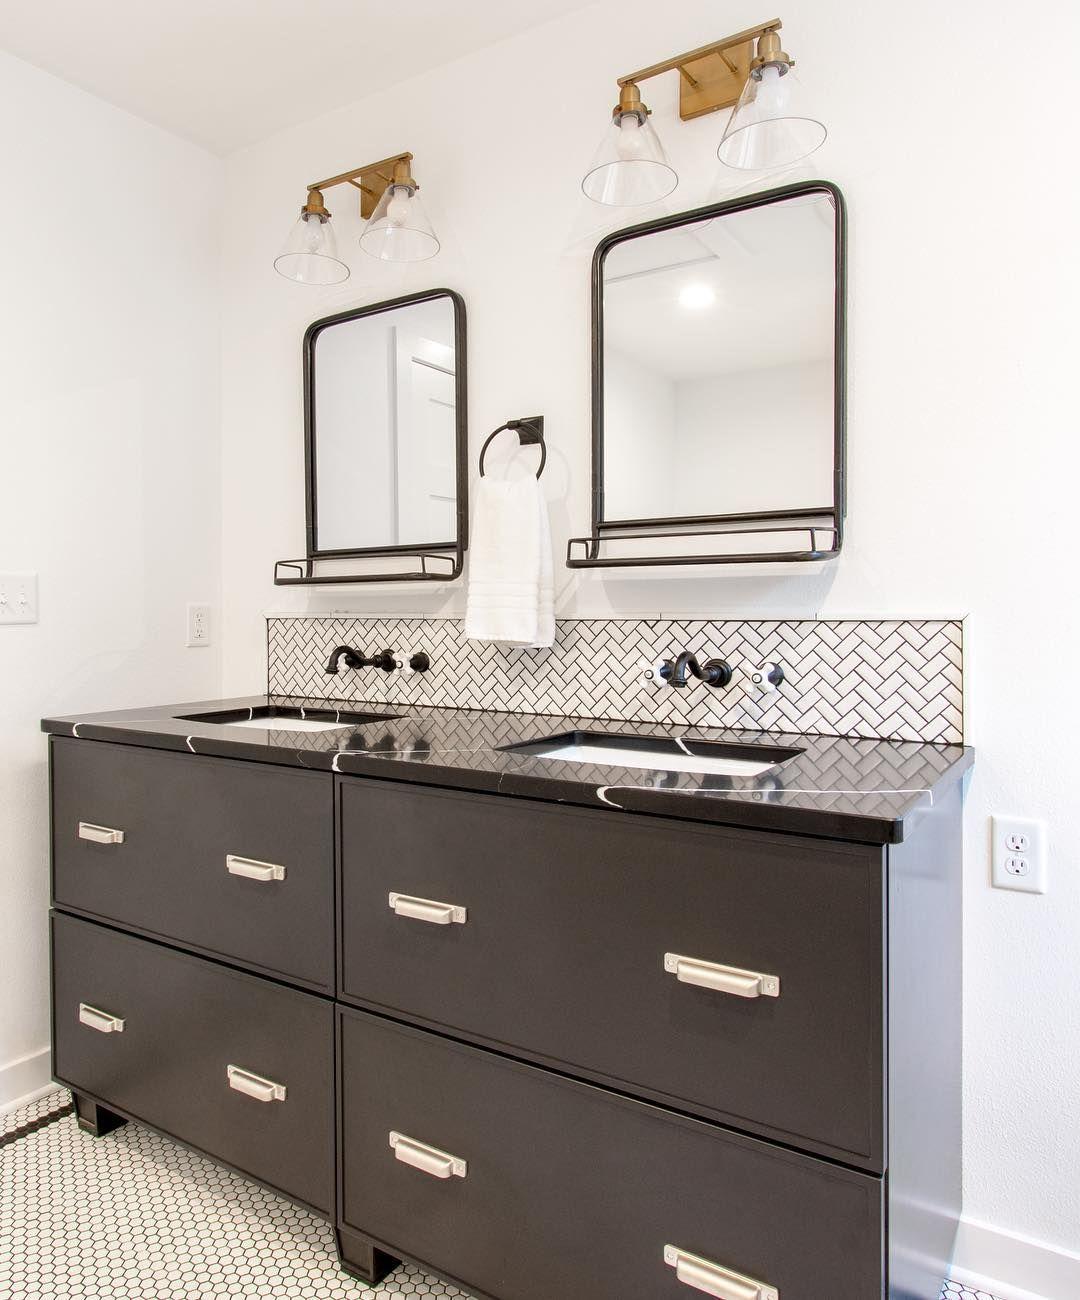 Ks3120px 8 Inch Center Wall Mount Bathroom Faucet Matte Black